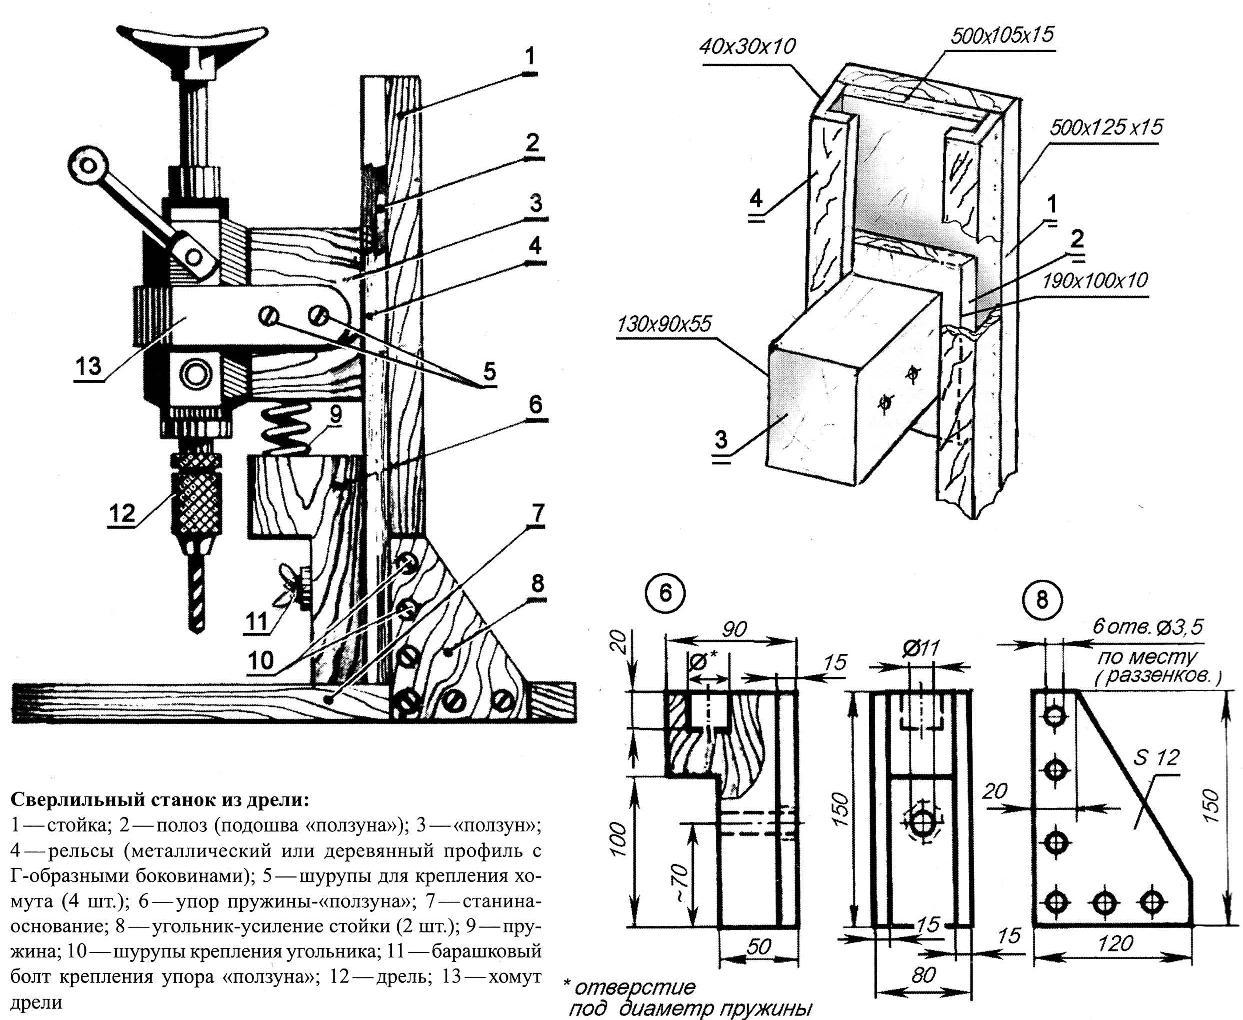 imgl3oyd 124 - Гаражные приспособы и самоделки